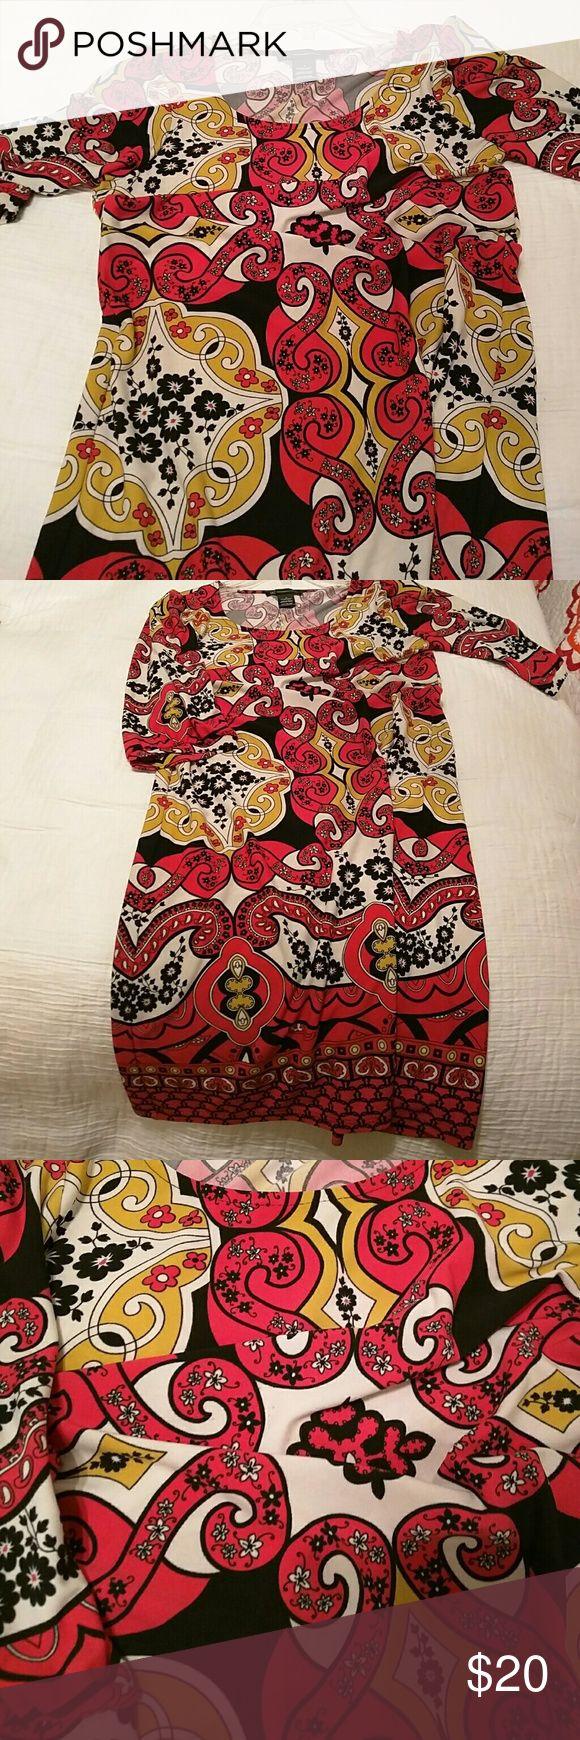 INC shift dress. Worn one time INC shift dress. Worn one time INC International Concepts Dresses Midi